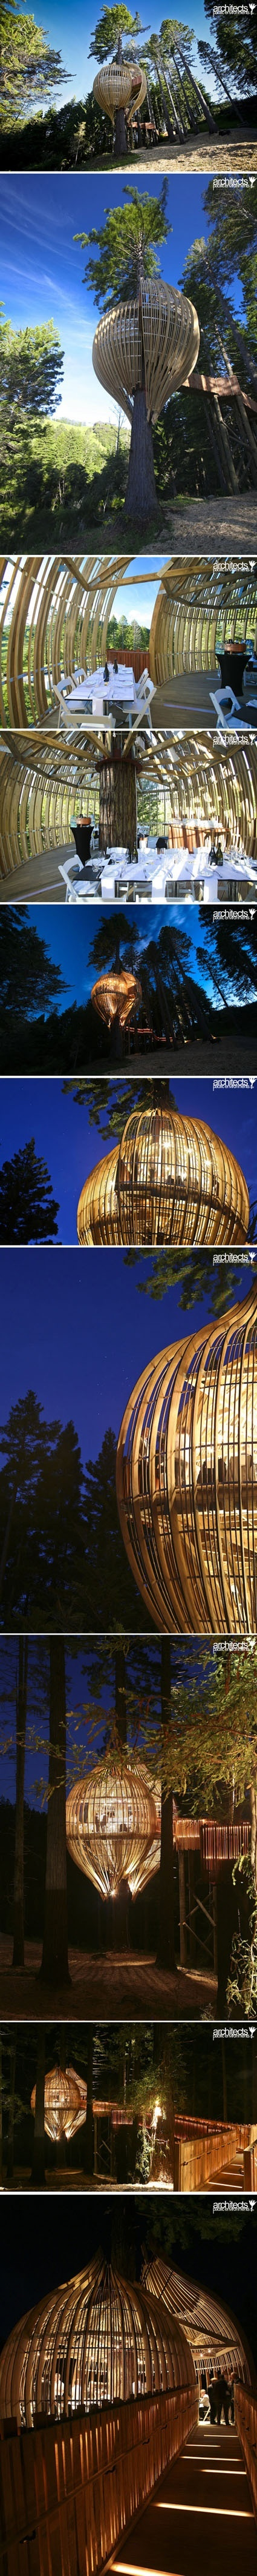 New Zealand TreeHouse Restaurant